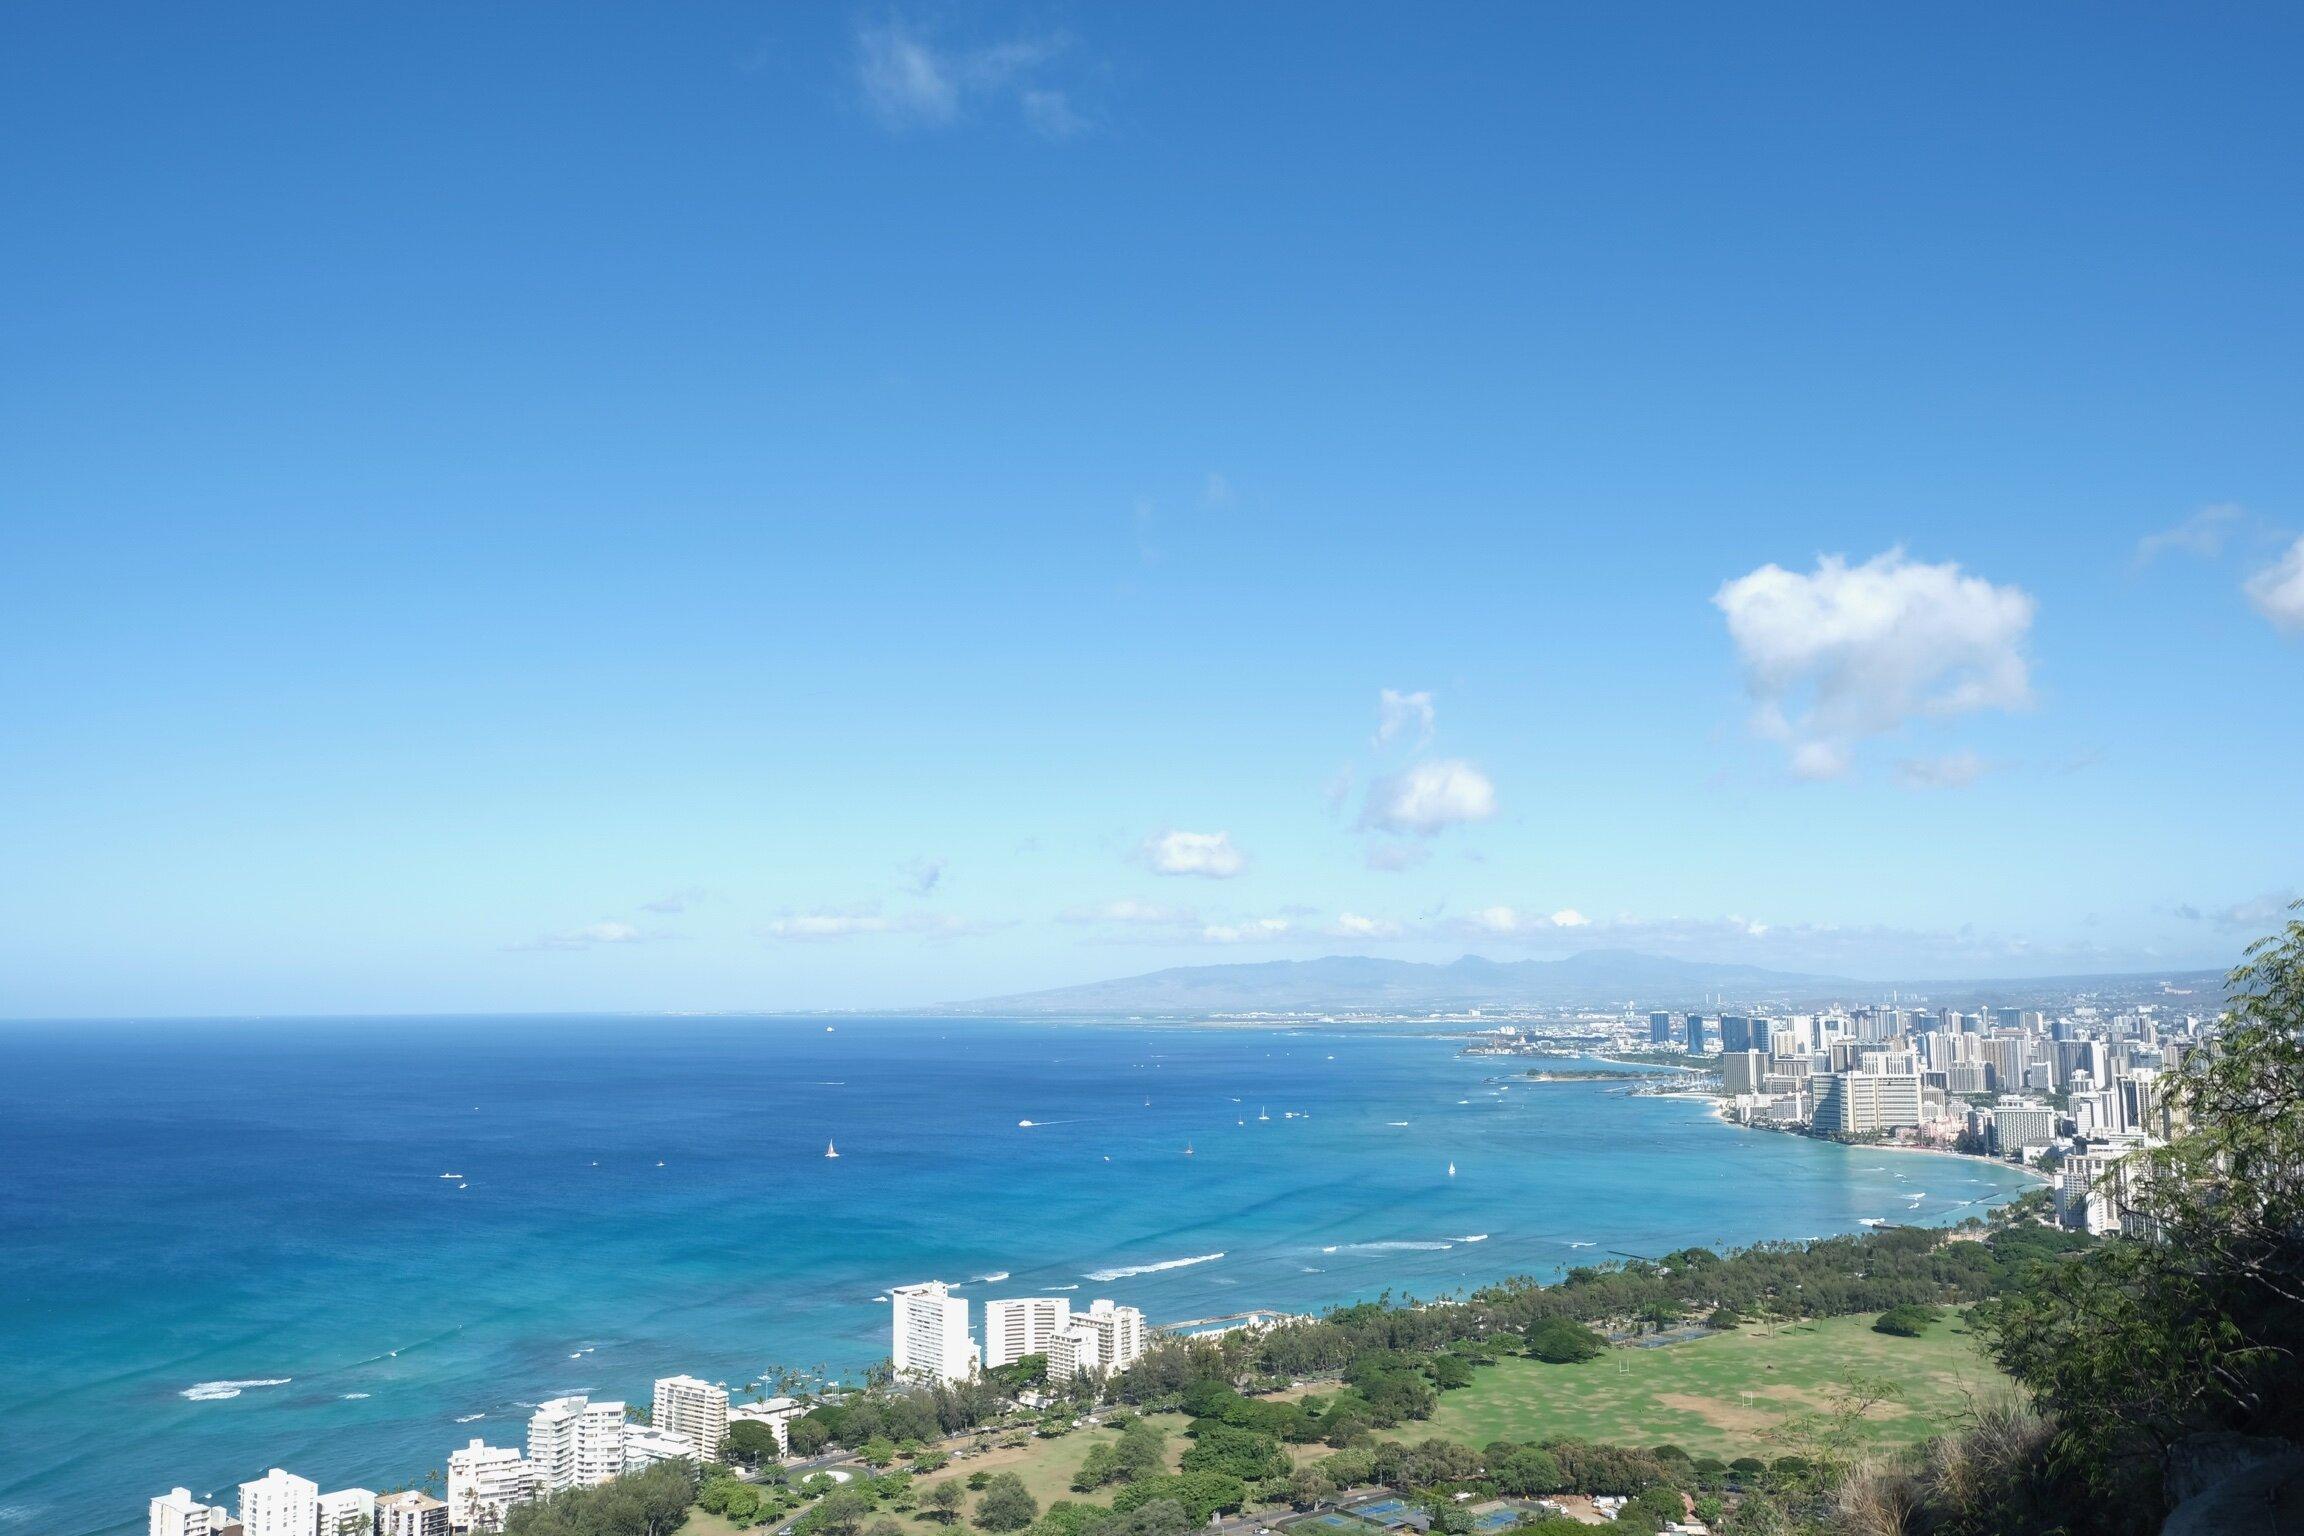 wakiki-beach-hawaii-diamondhead-travel-blog-travel-itinerary